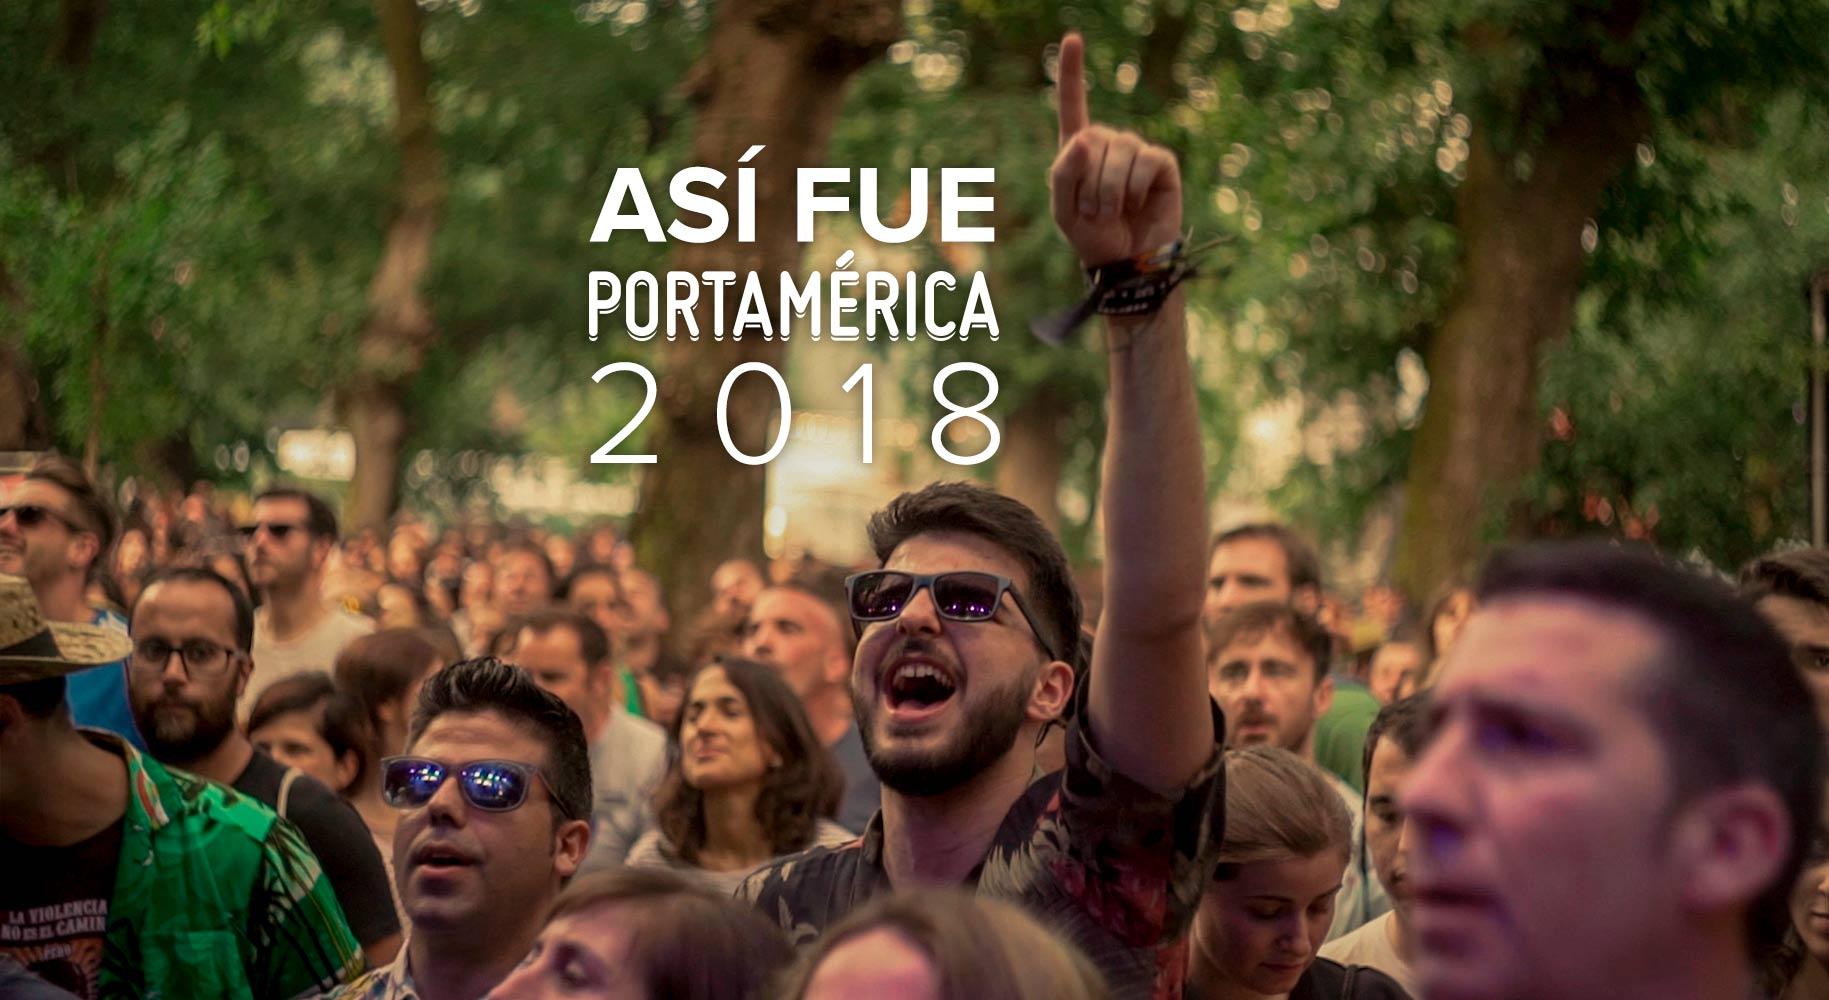 ¡Así fue PortAmérica 2018!